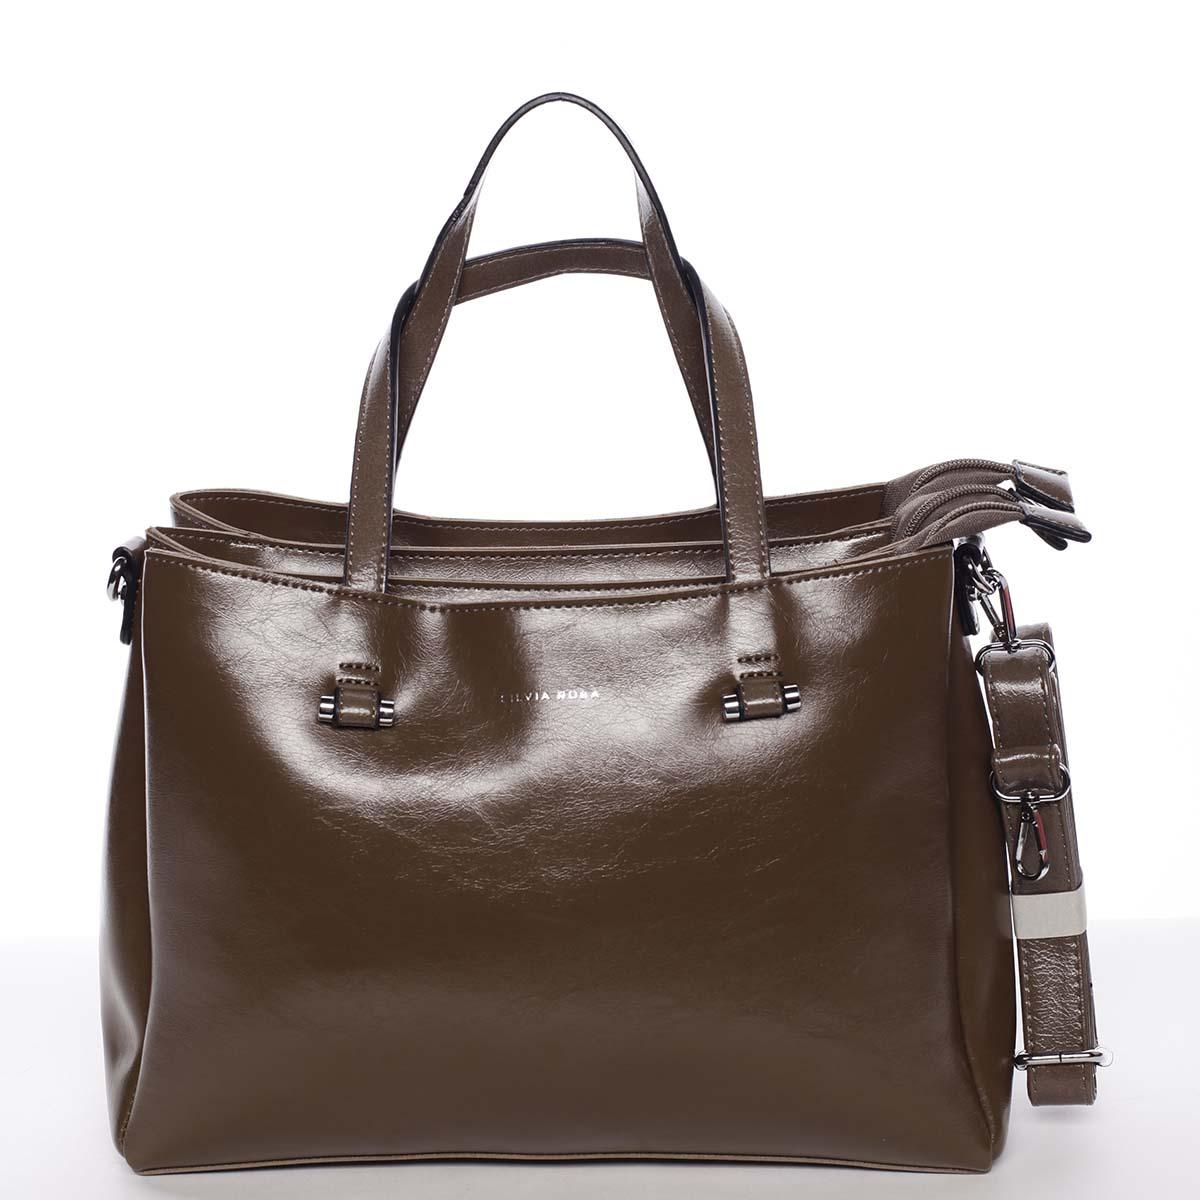 Hnedá elegantná kabelka - Silvia Rosa Saba hnedá